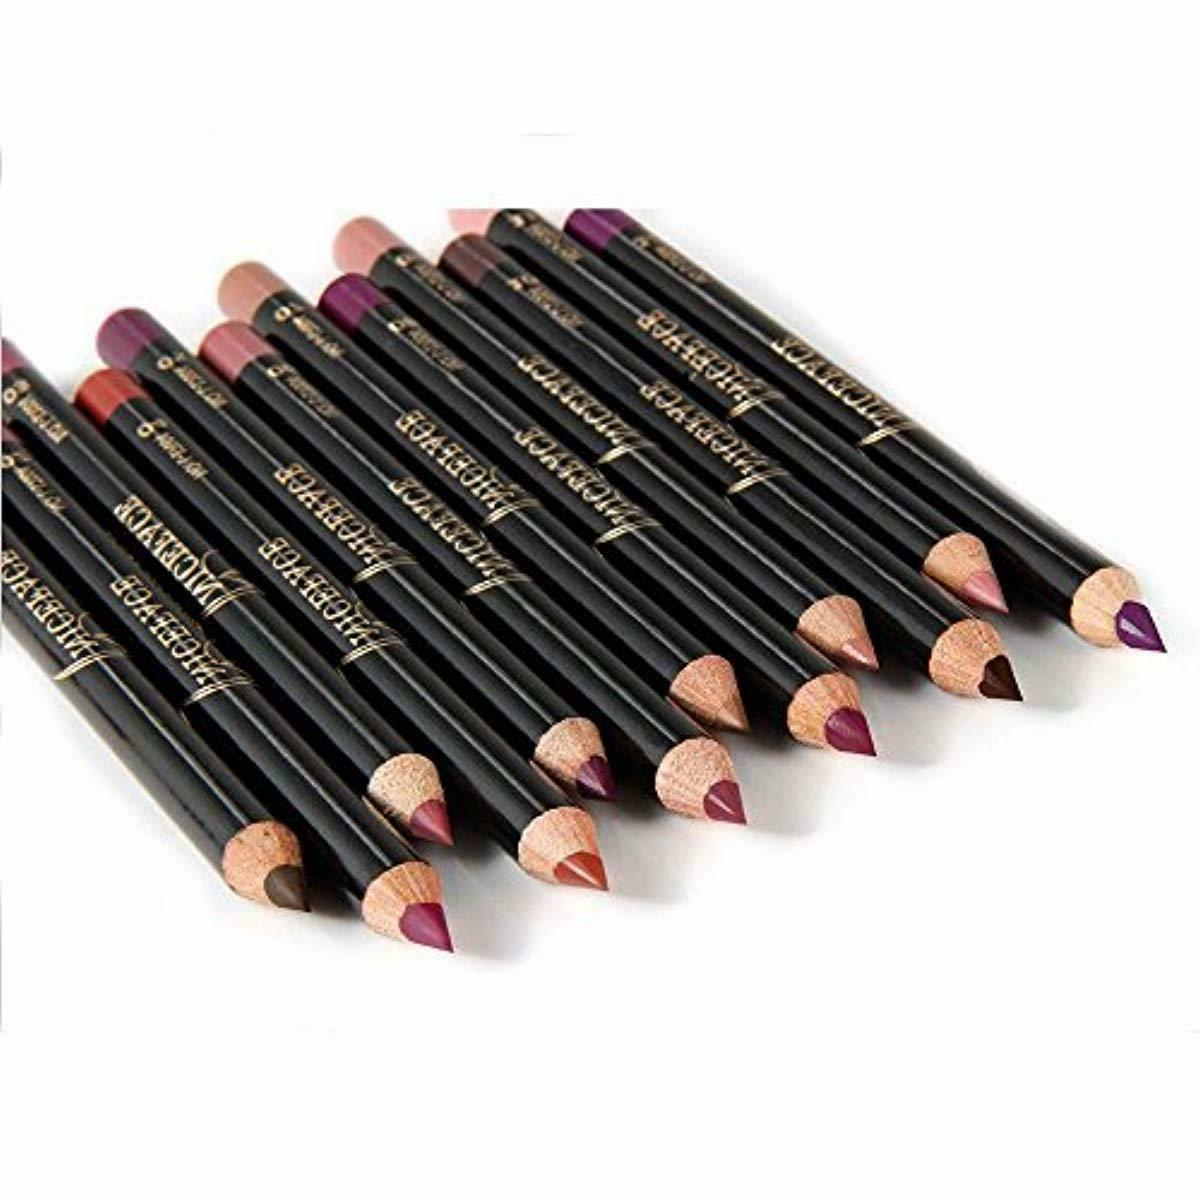 NICEFACE 12 Color Pencil Soft Waterproof Smooth Lip Lipliner Pen